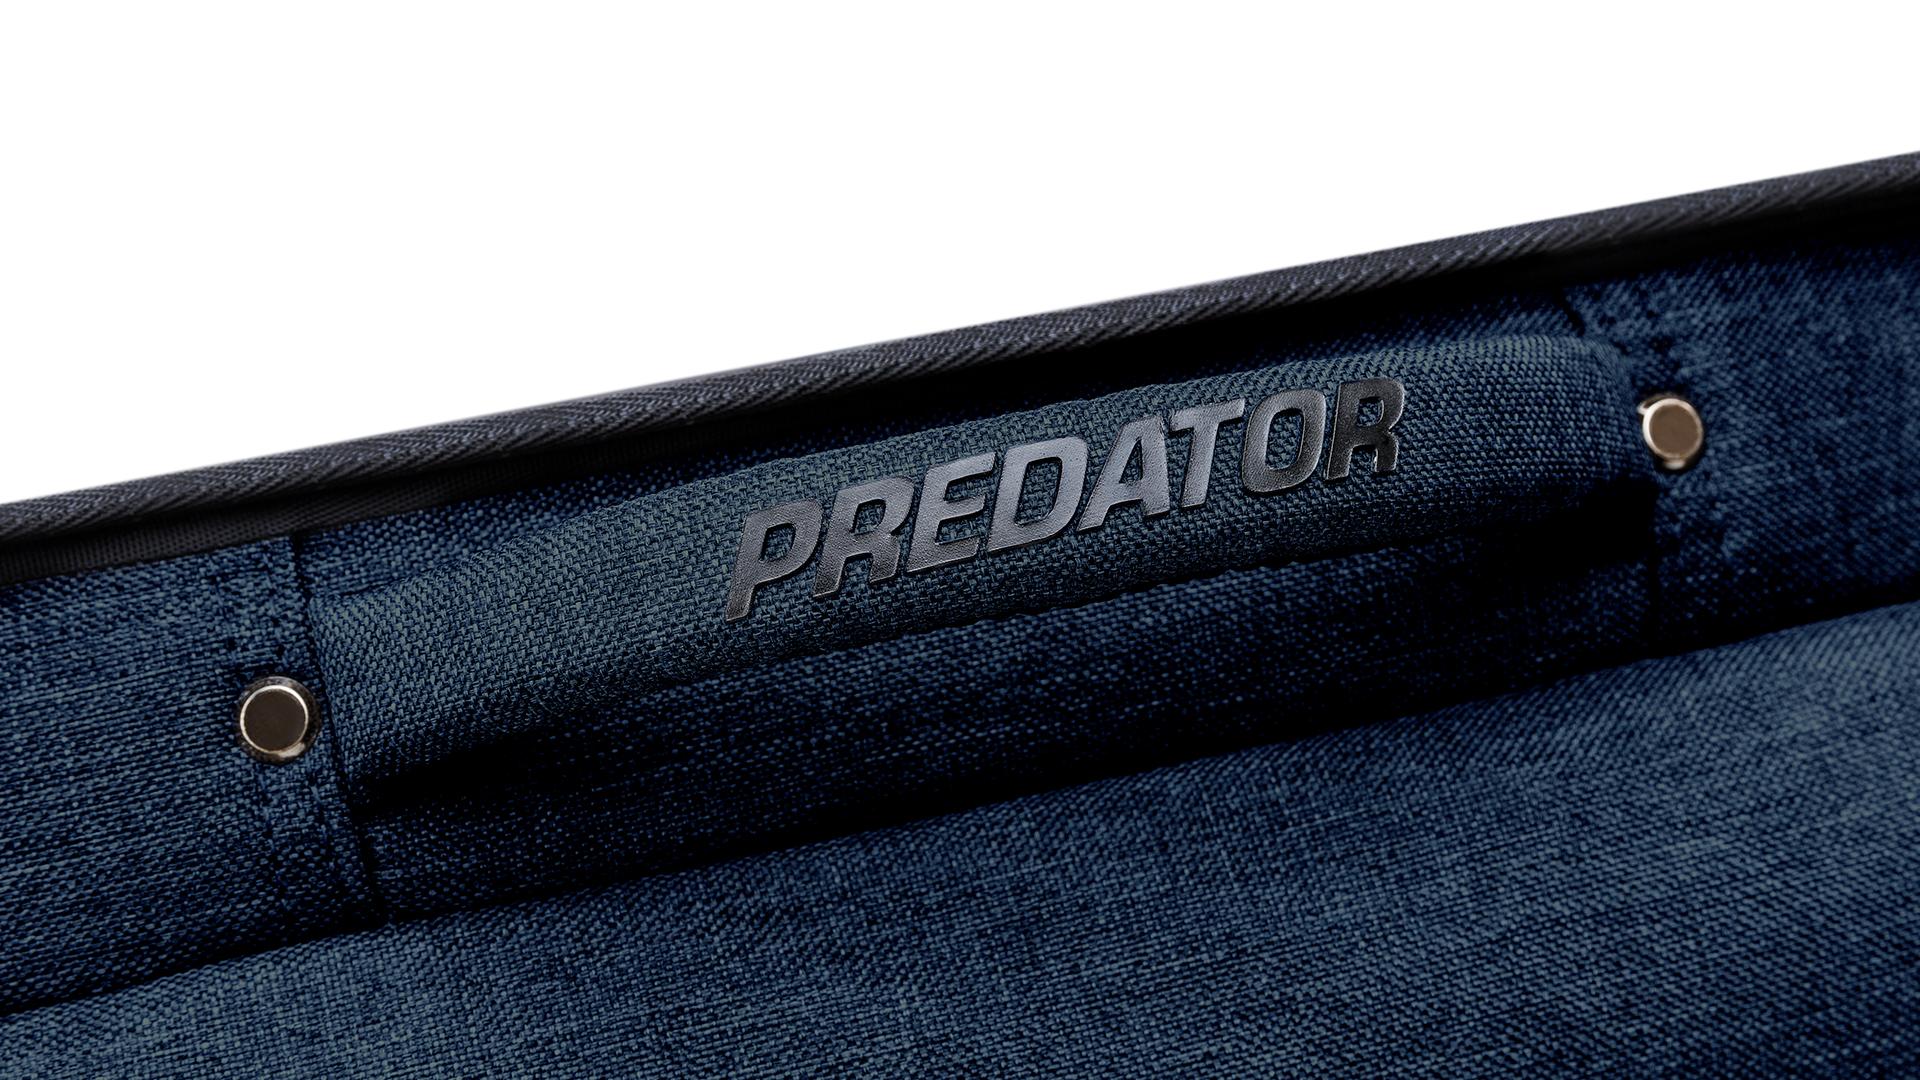 18 Predator Urbain Blue